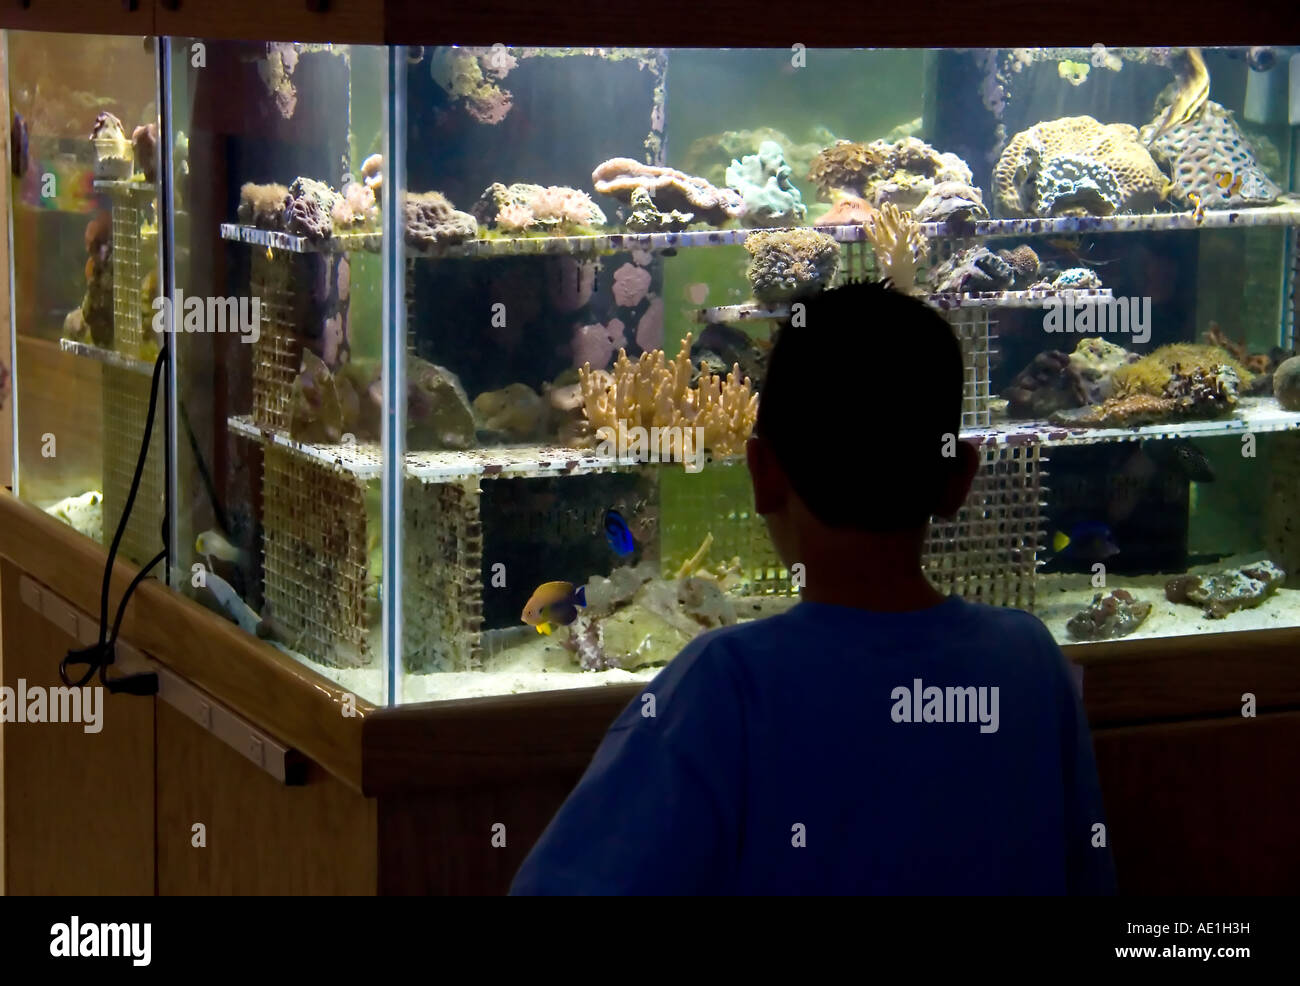 Fish aquarium utah - A Silhouetted Hispanic Boy Gazing Into A Reef Aquarium In A Pet Store In Utah